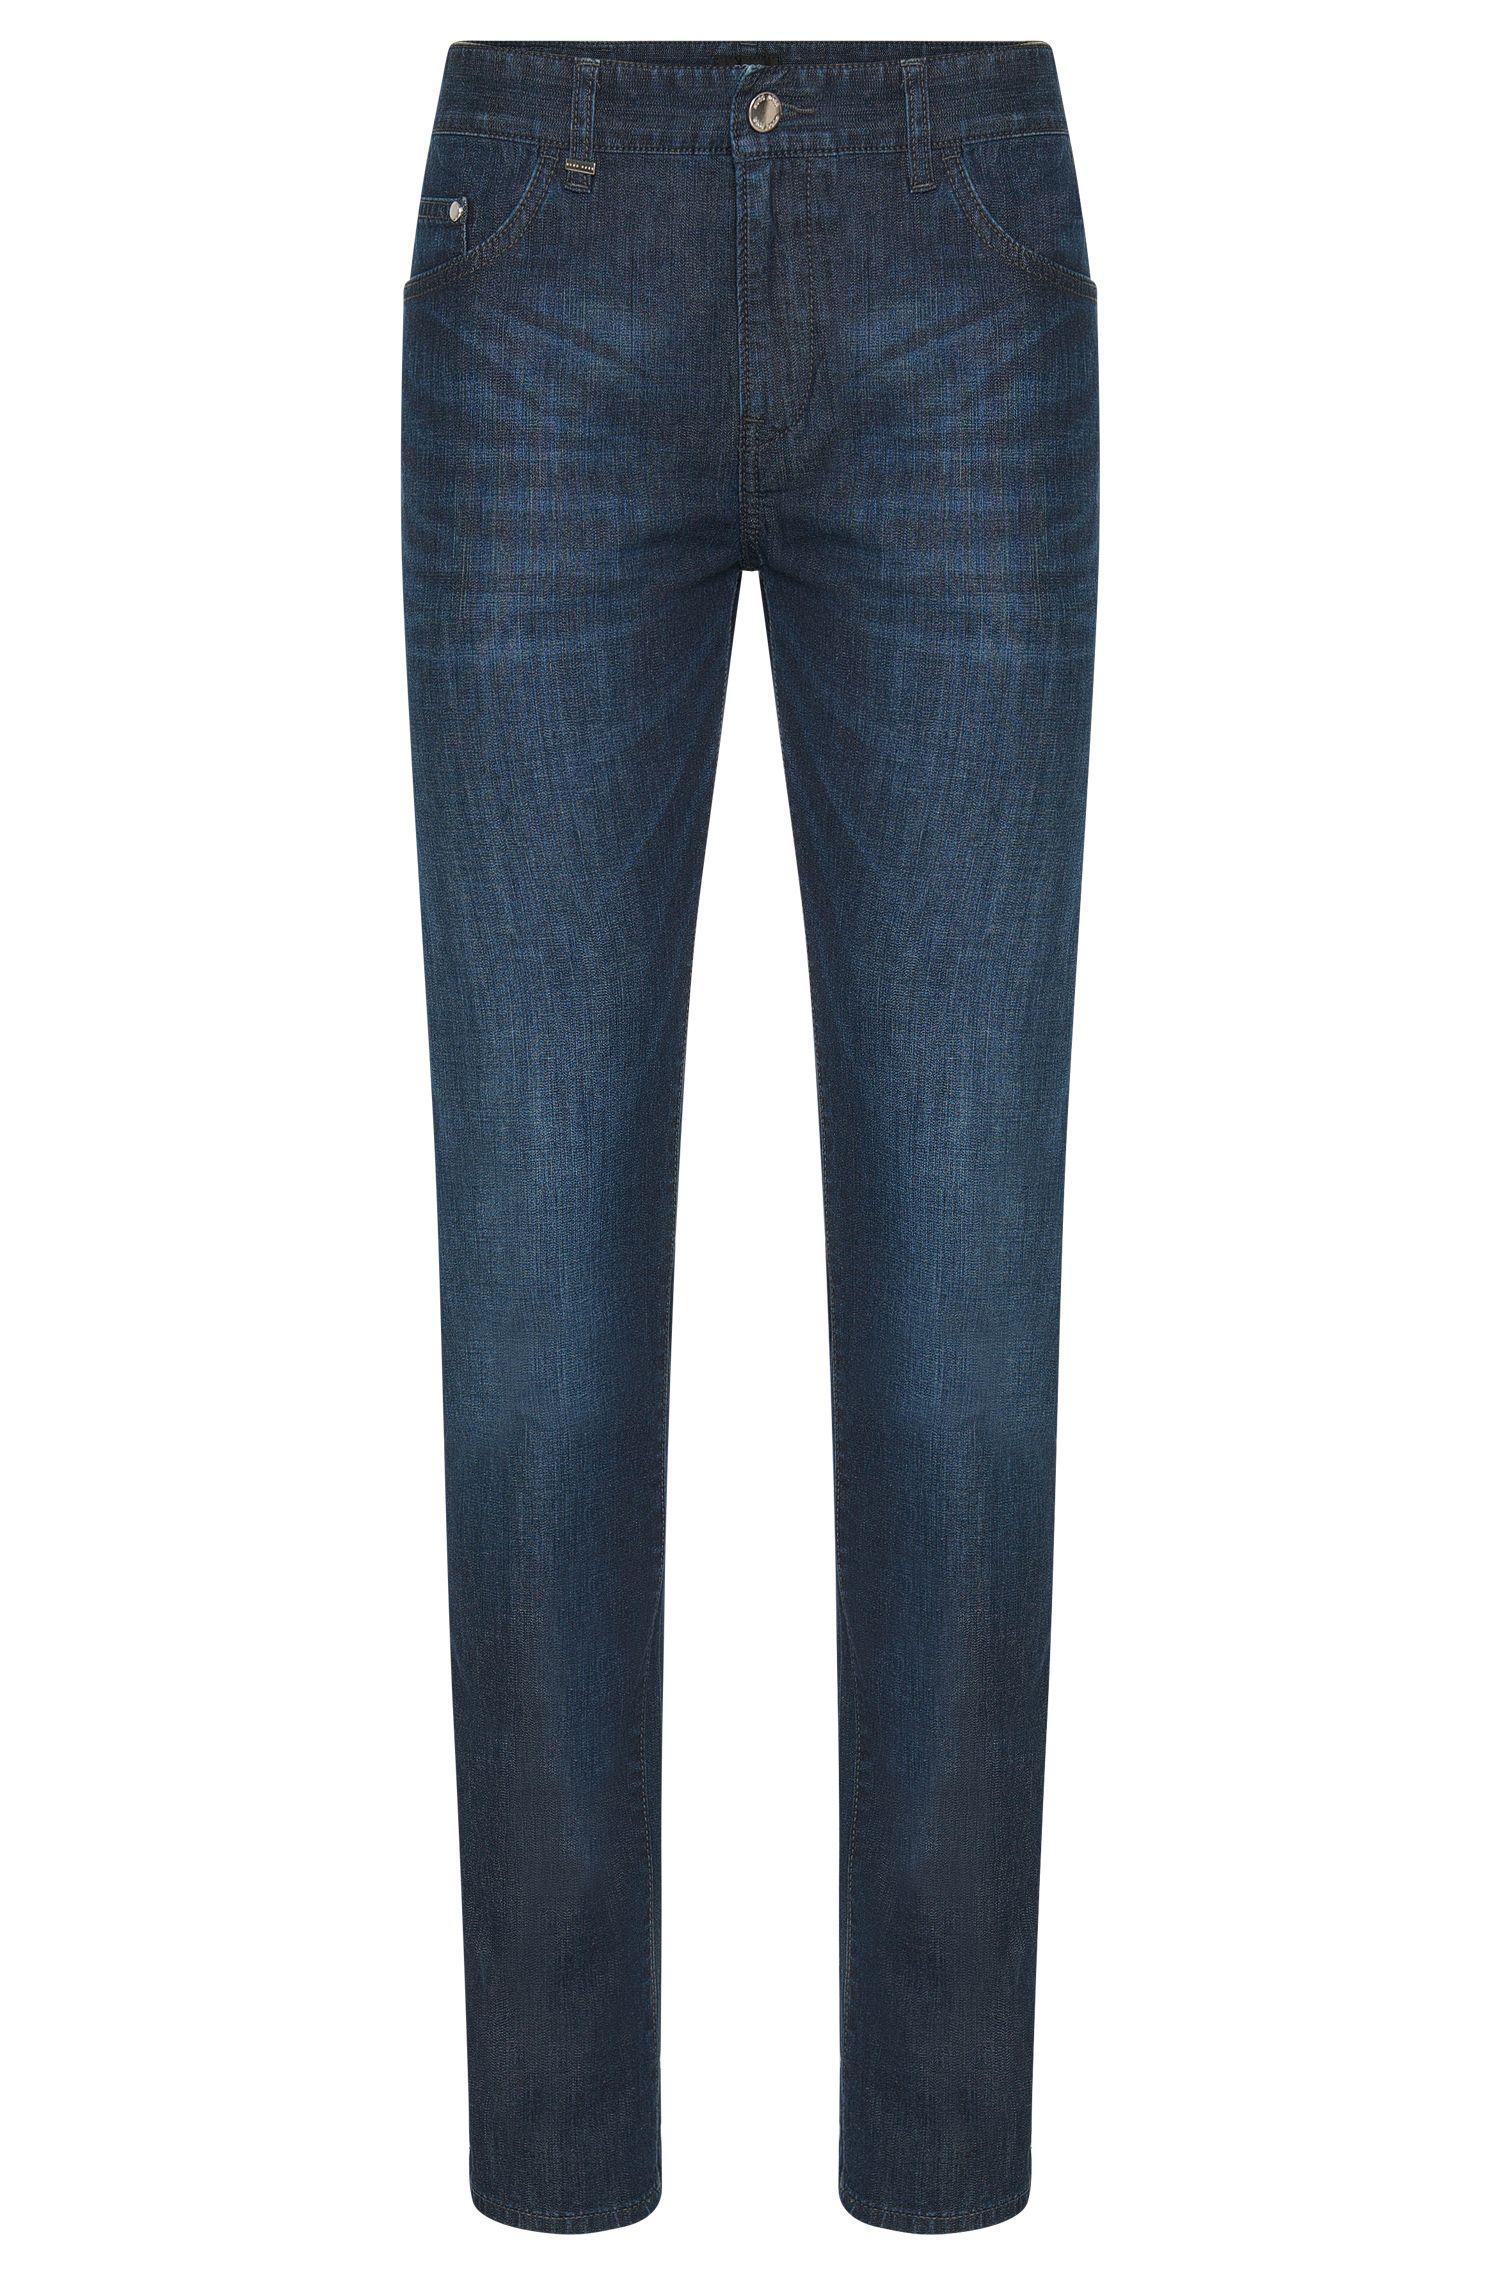 Slim-Fit Jeans aus Stretch-Baumwolle: 'Delaware3-1'